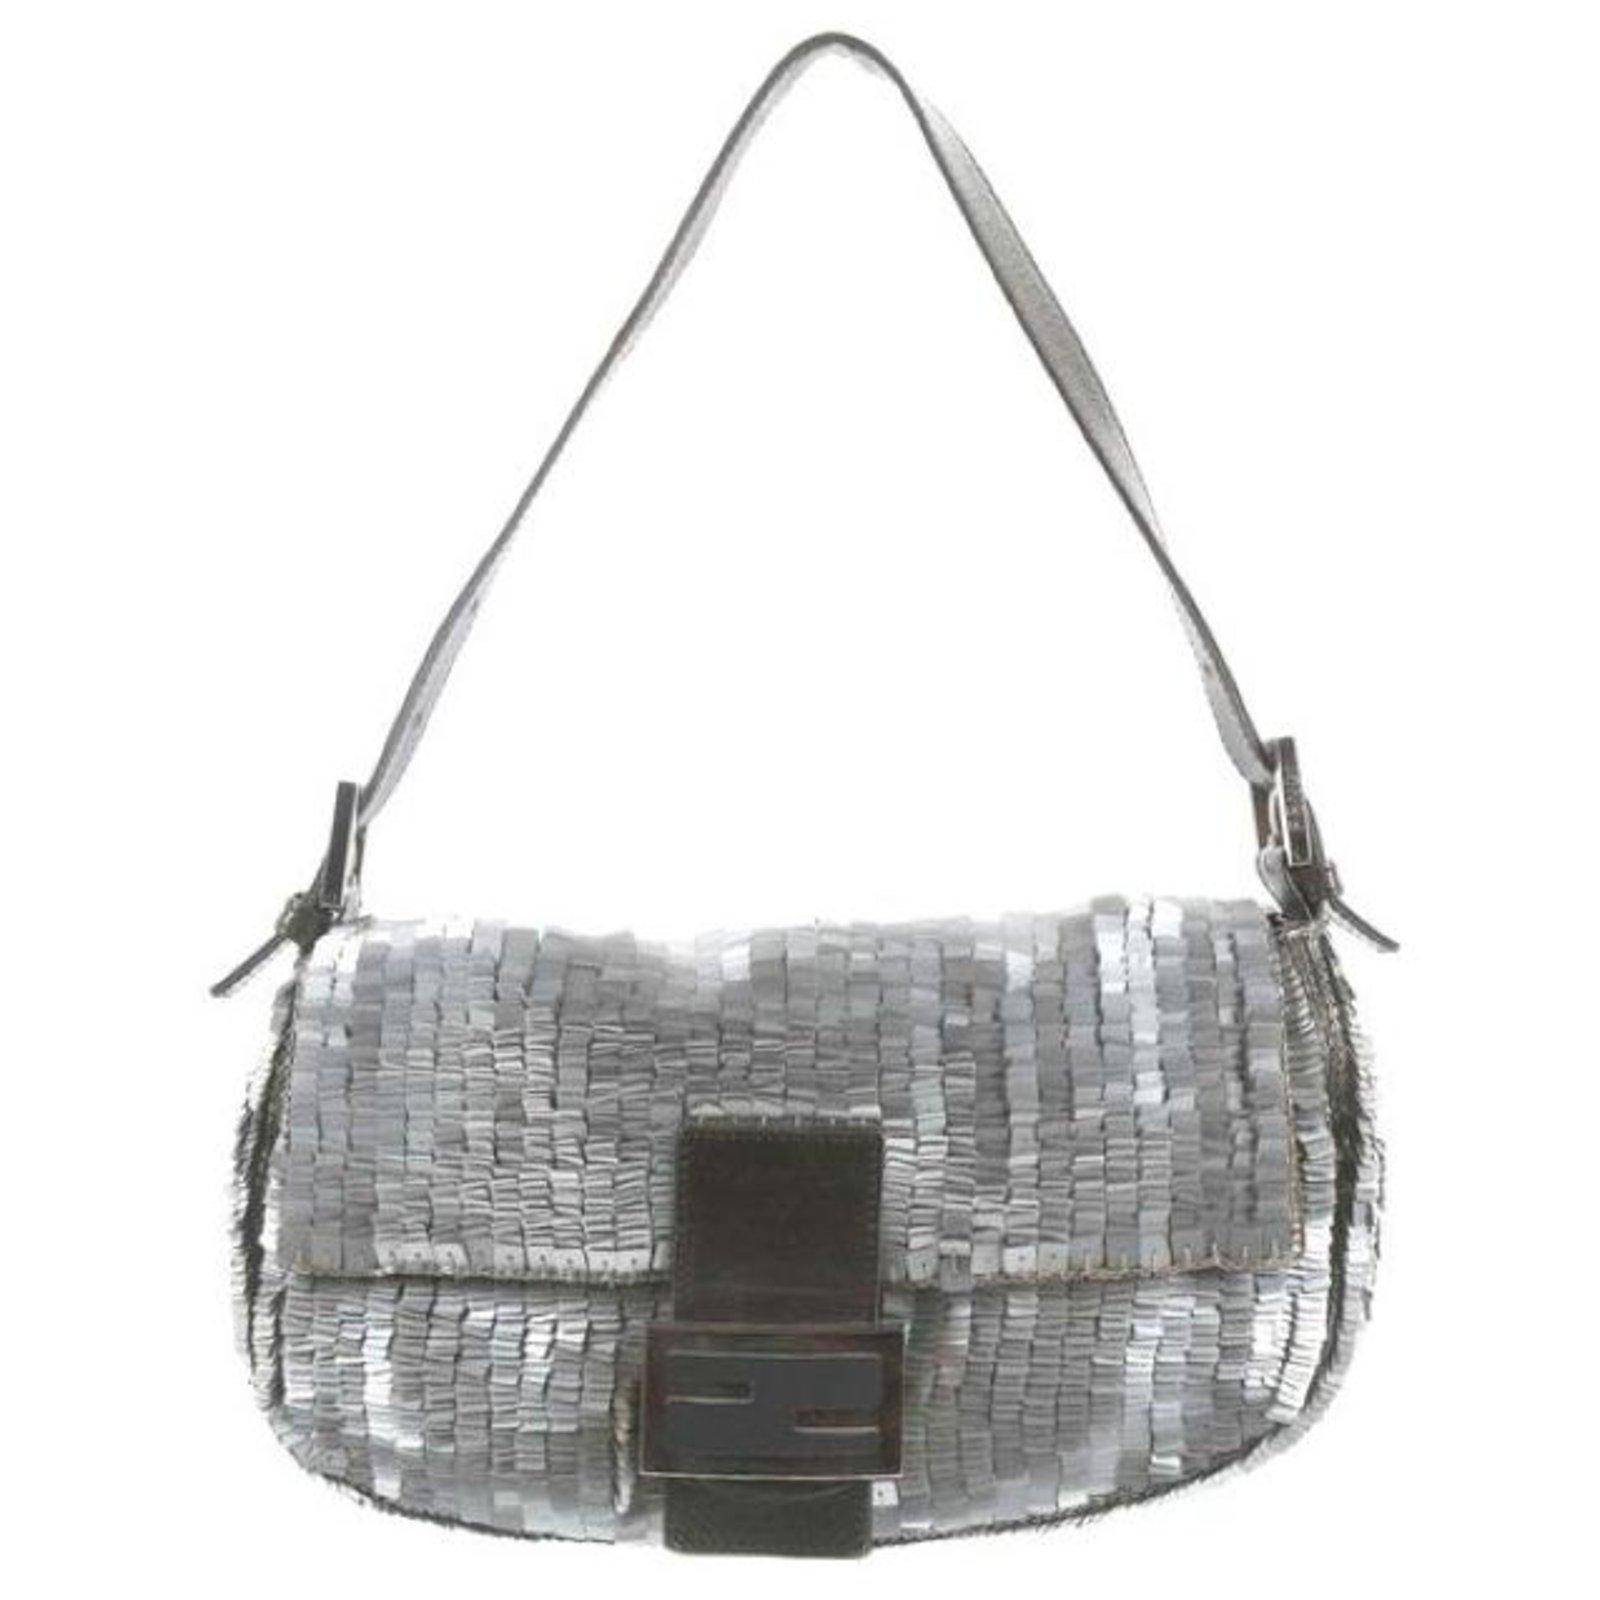 8b903b11df5a Fendi BAGUETTE Handbags Other Metallic ref.117985 - Joli Closet